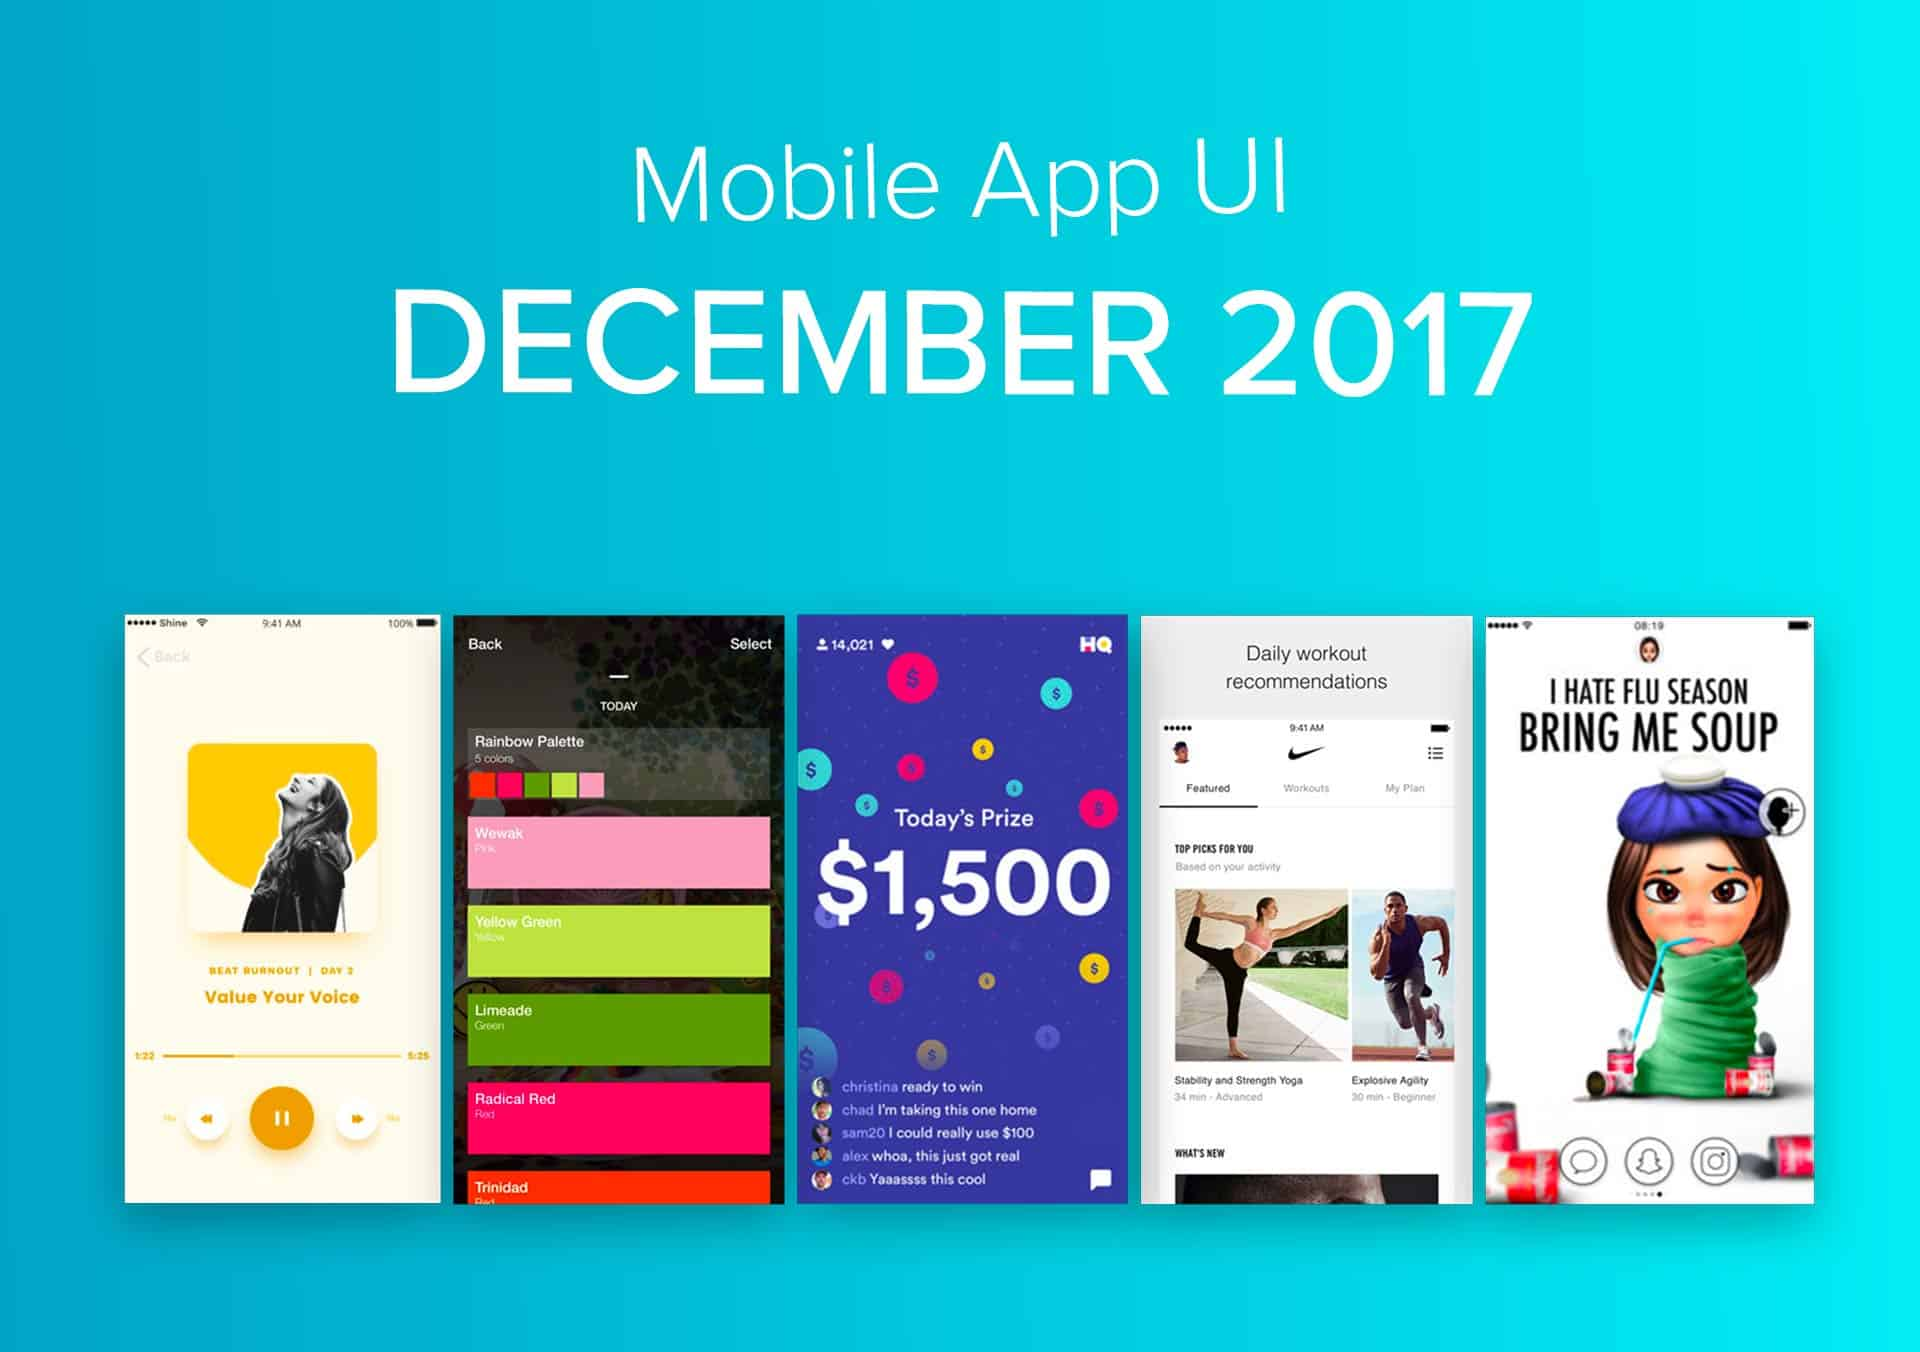 best mobile dating app 2017